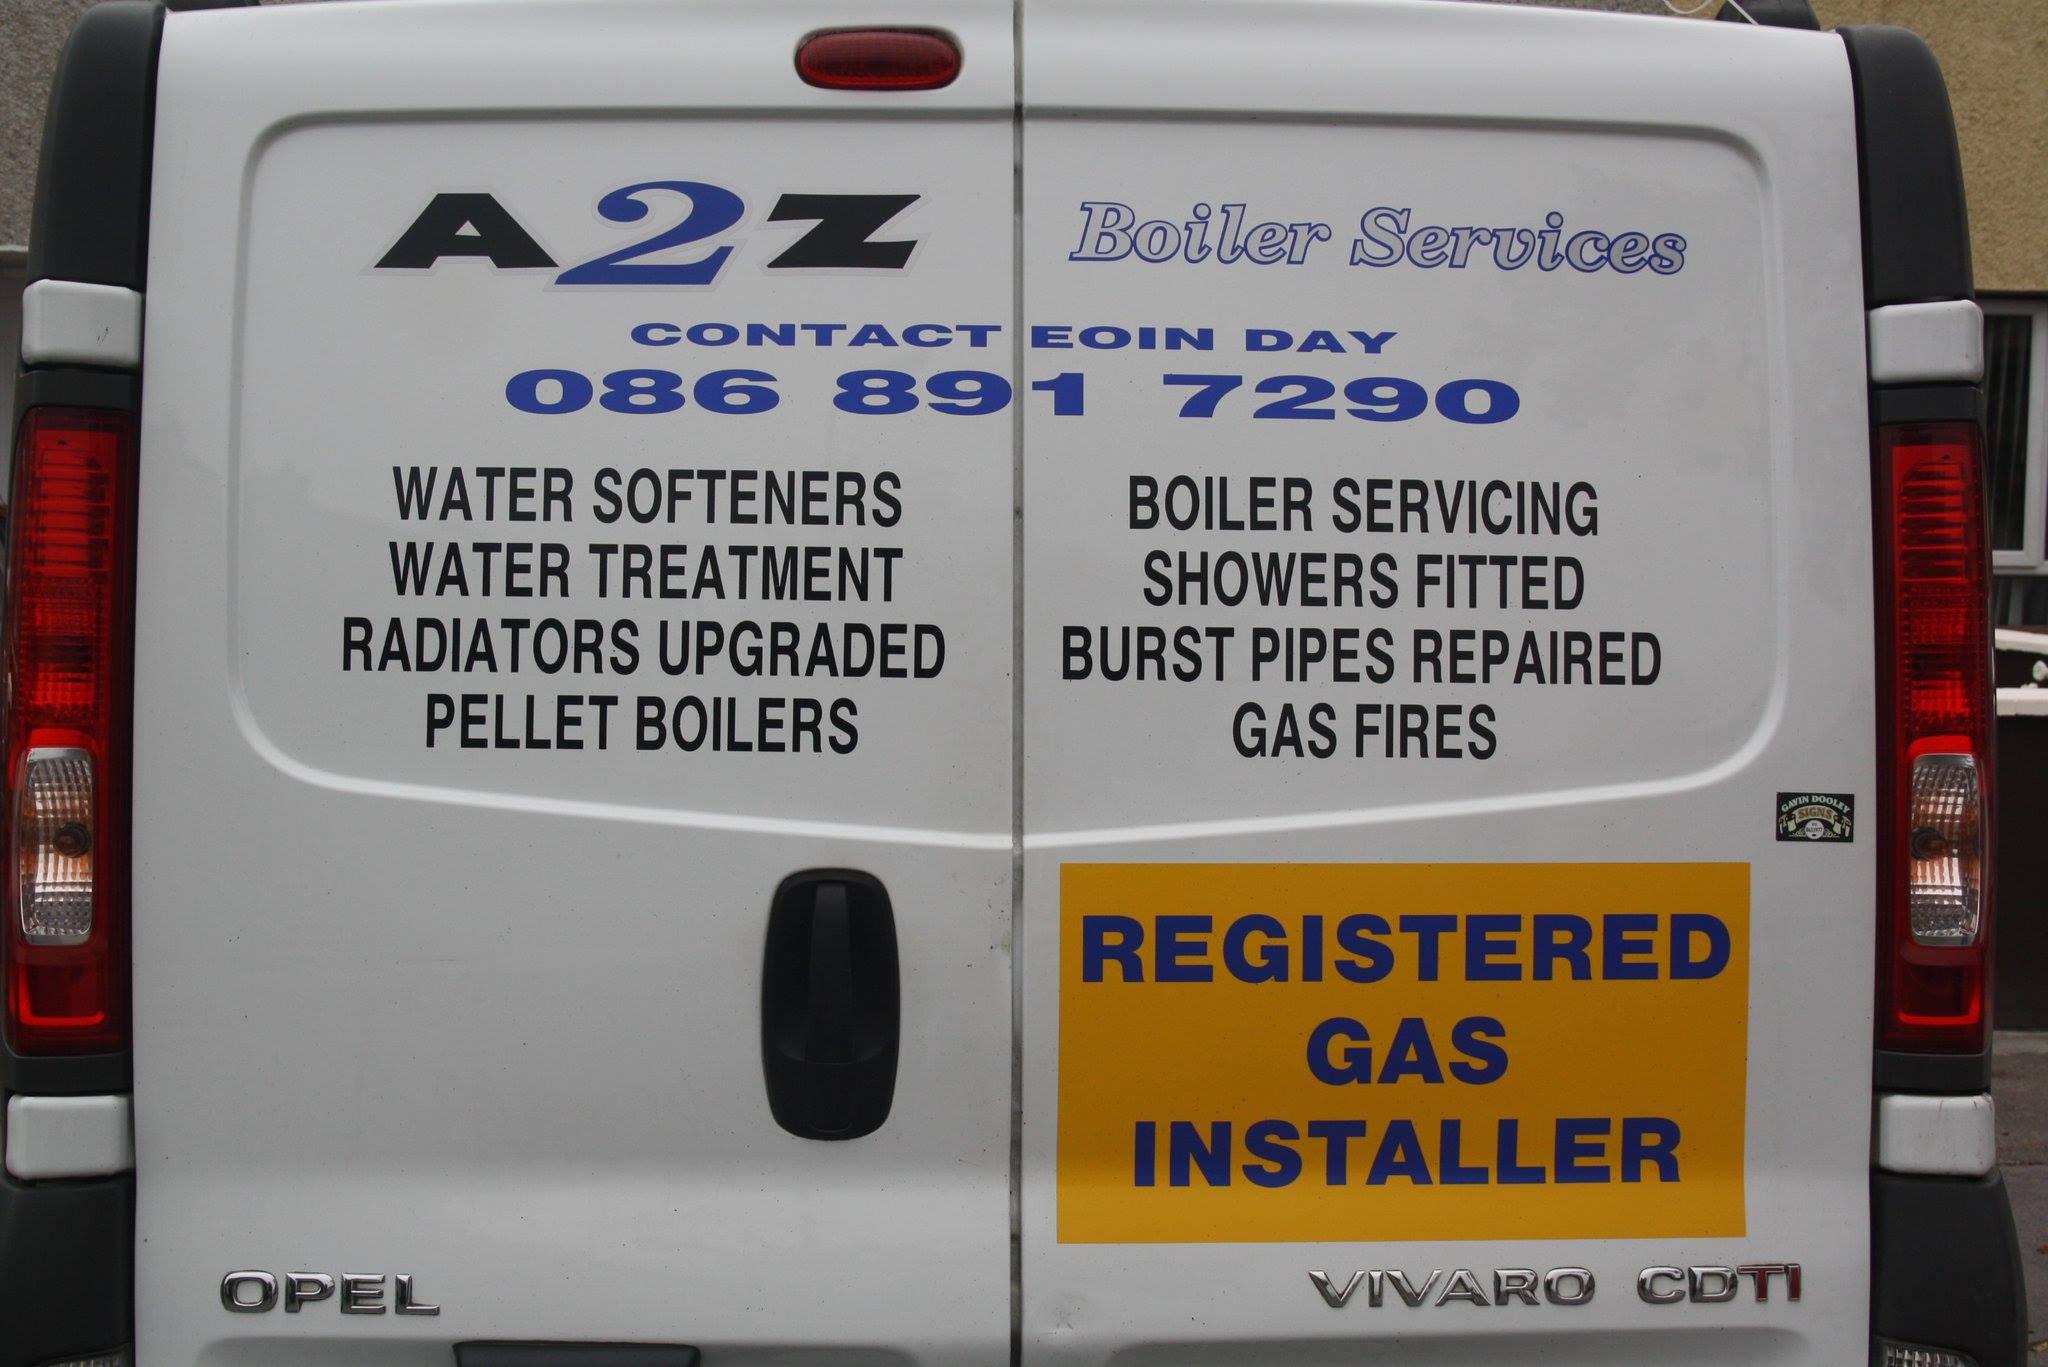 A2Z Boiler Services image 1